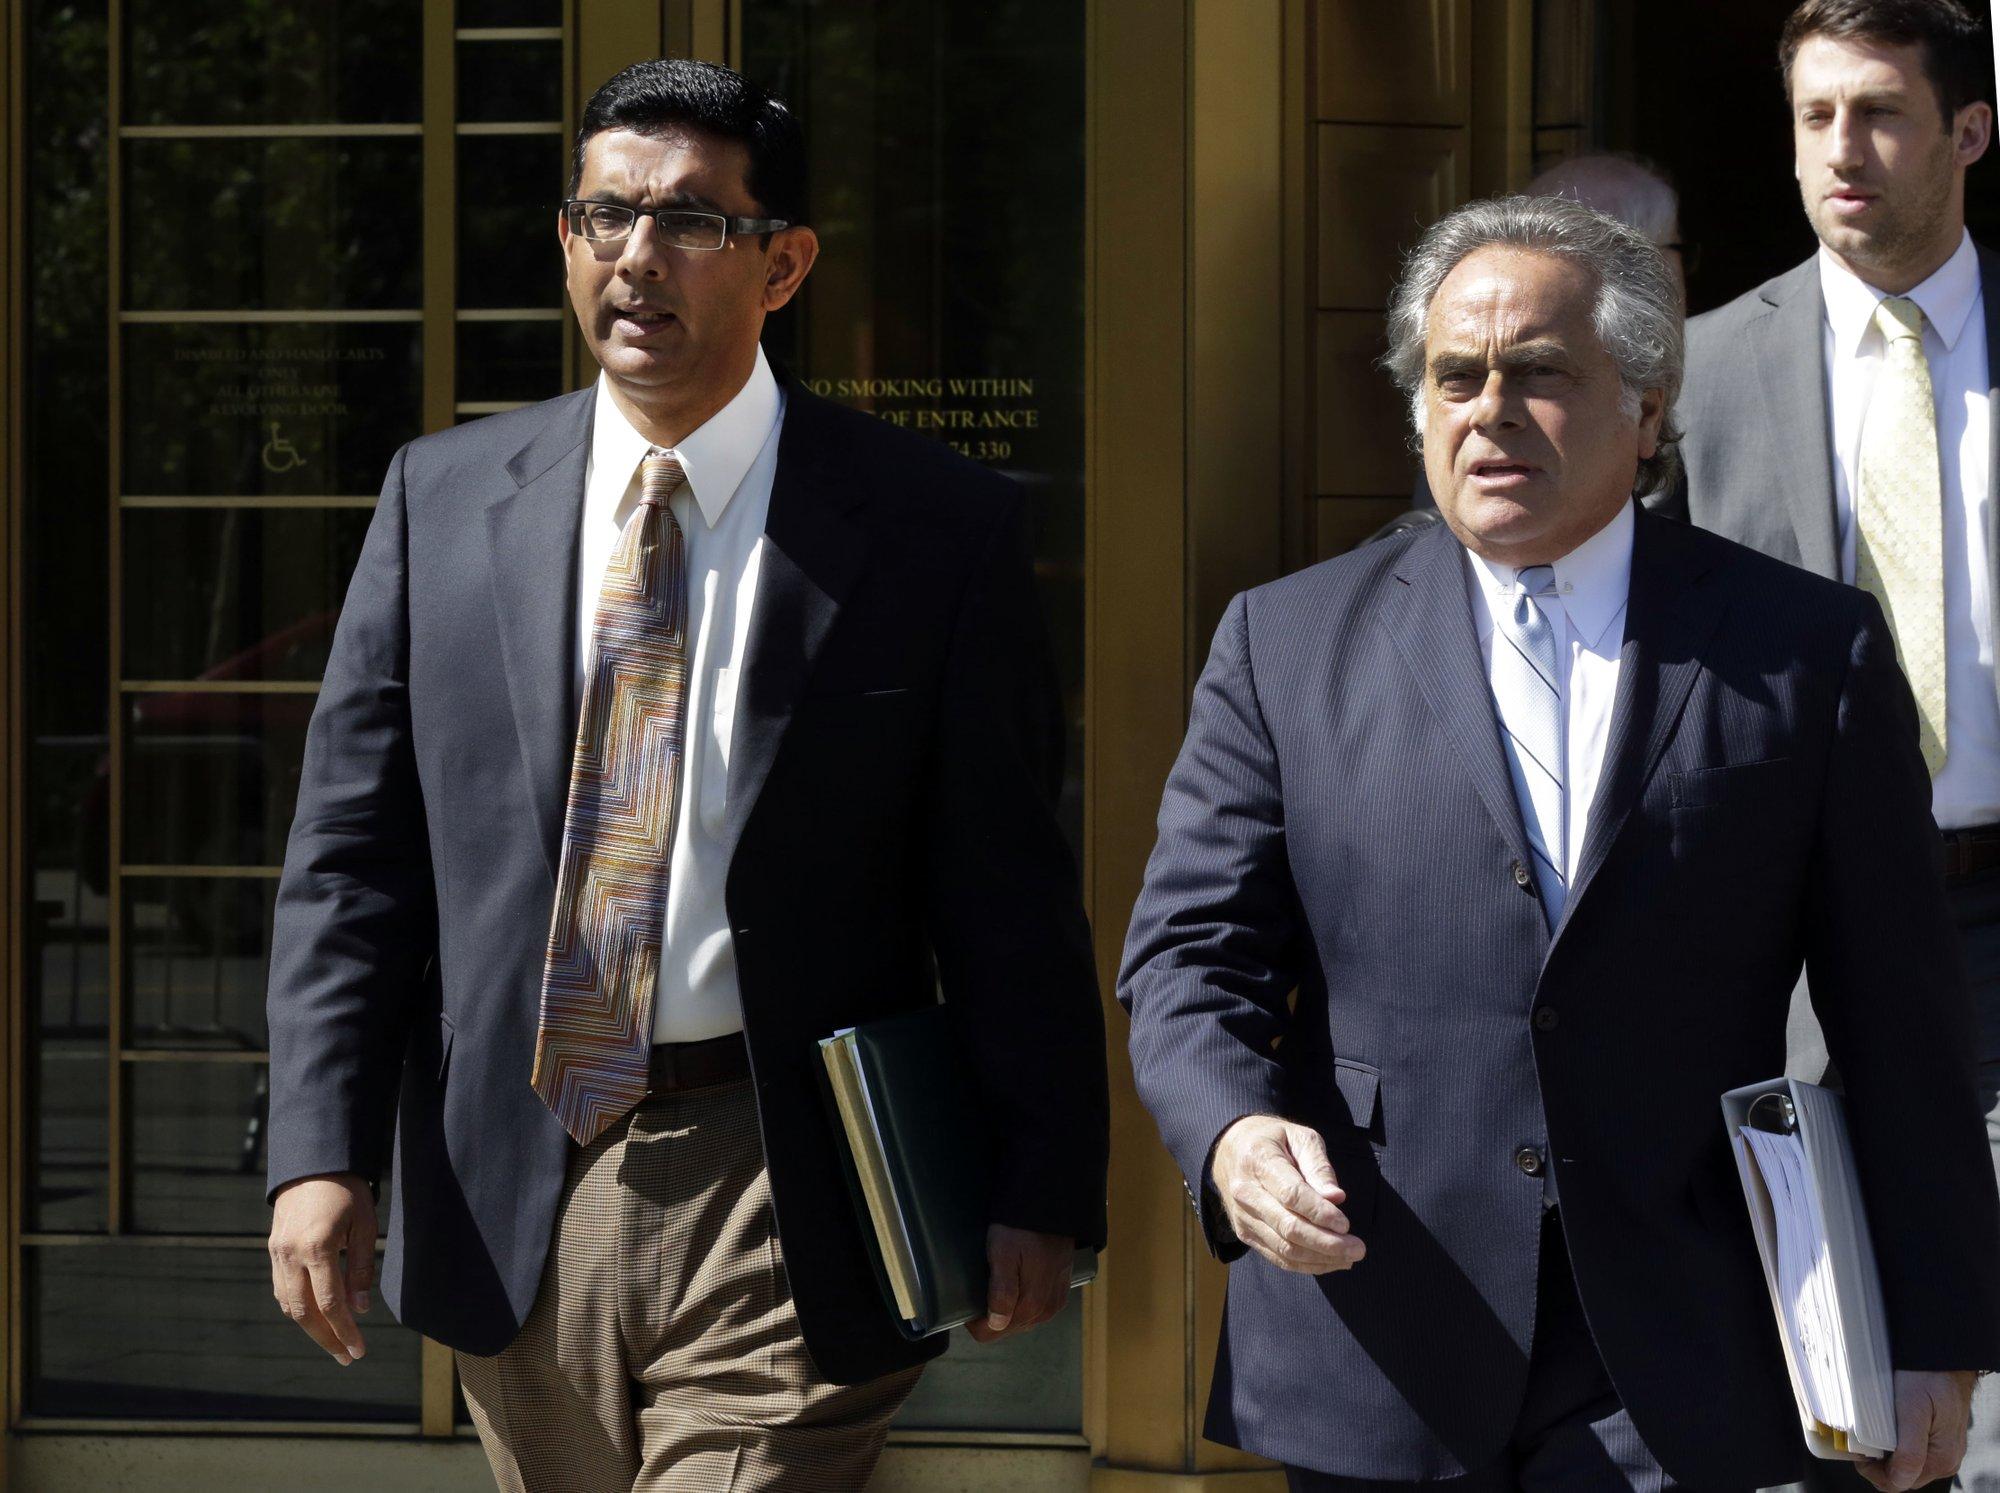 The Latest: Trump pardons conservative commentator D'Souza